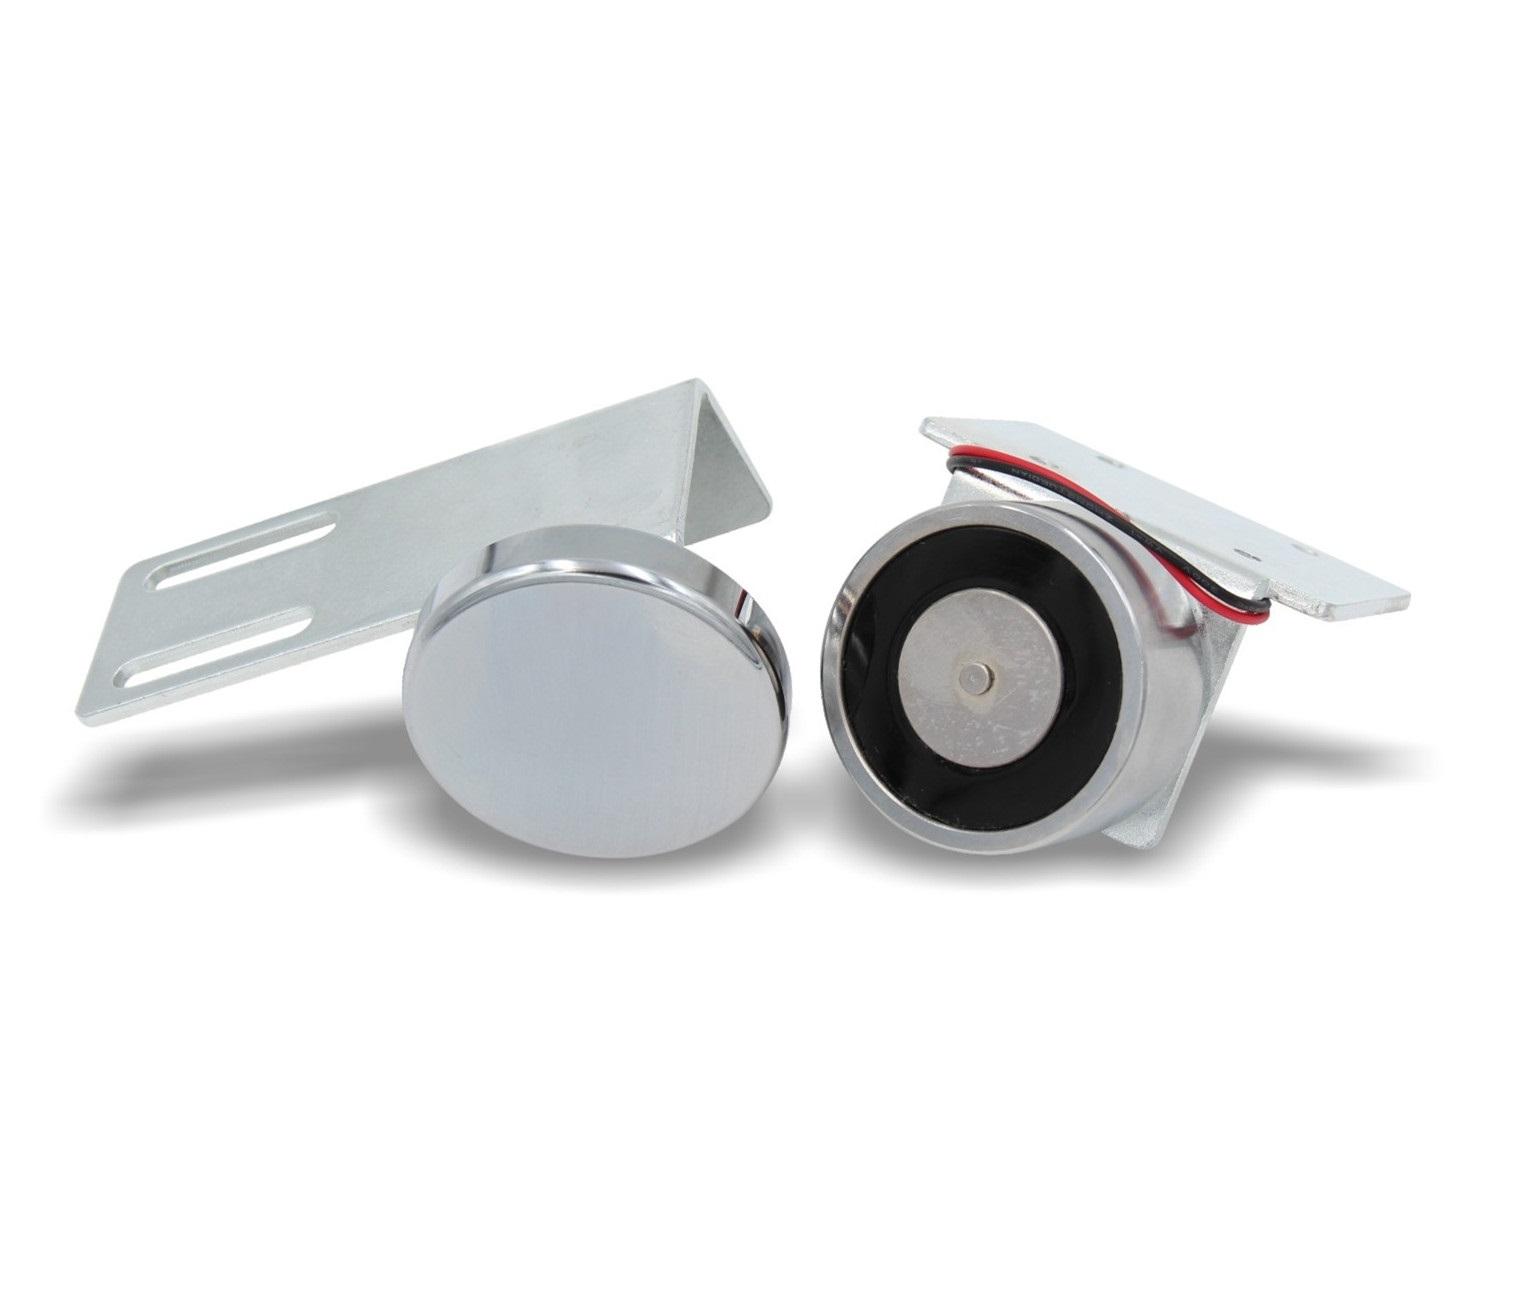 Magnetic lock for Automatic door, electric lock, automatic door lock